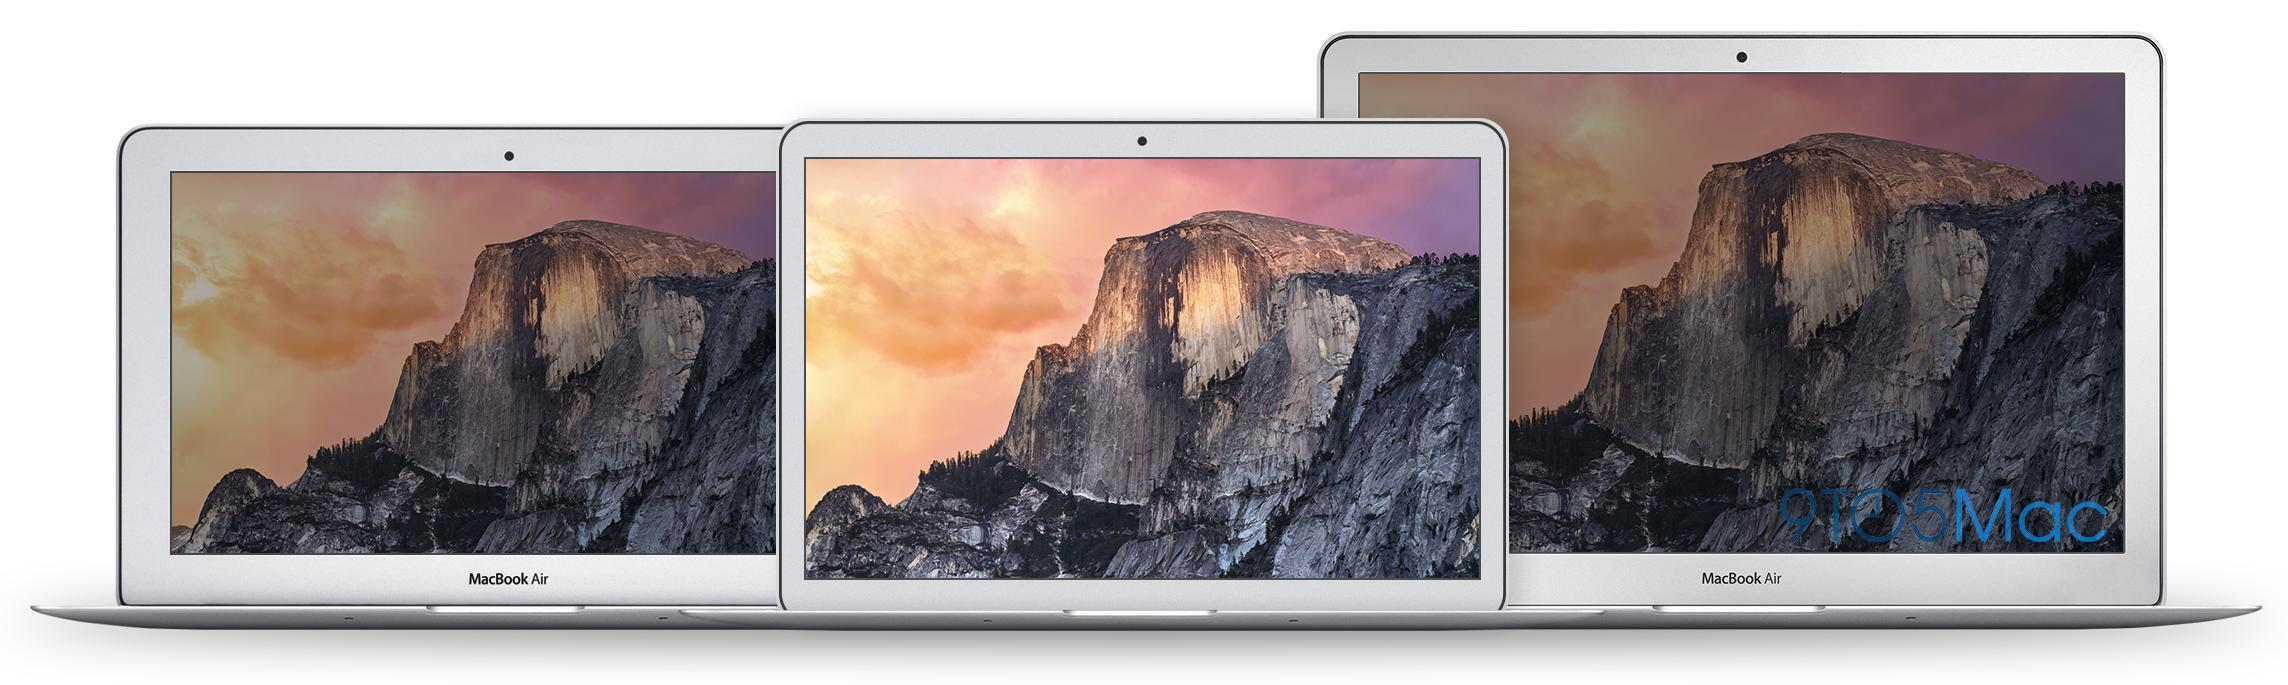 Fra venstre: Dagens MacBook Air 11